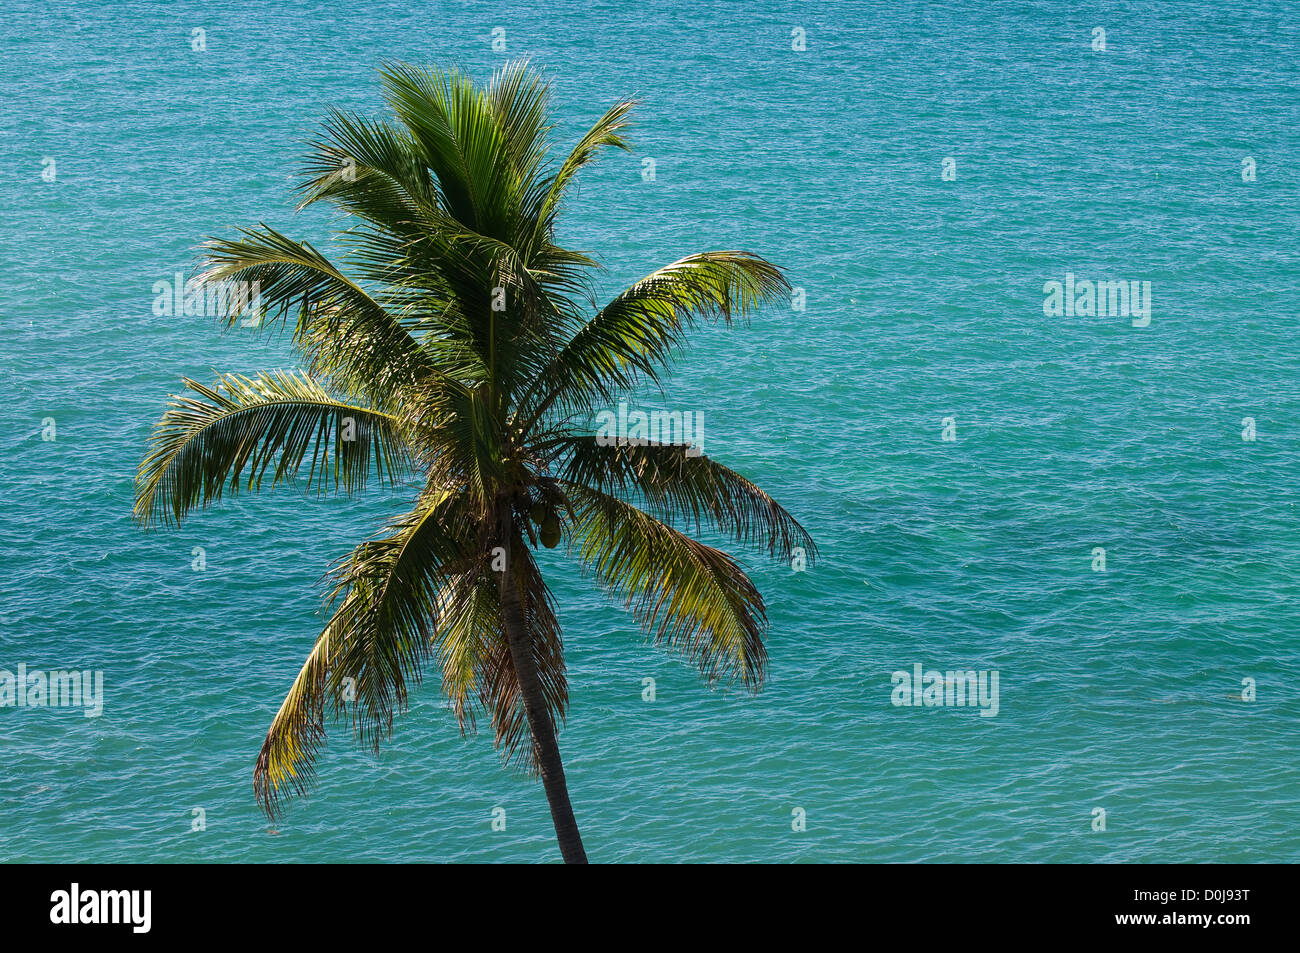 Coconut palm tree and tropical ocean, Bahia Honda State Park, The Florida Keys, Florida - Stock Image